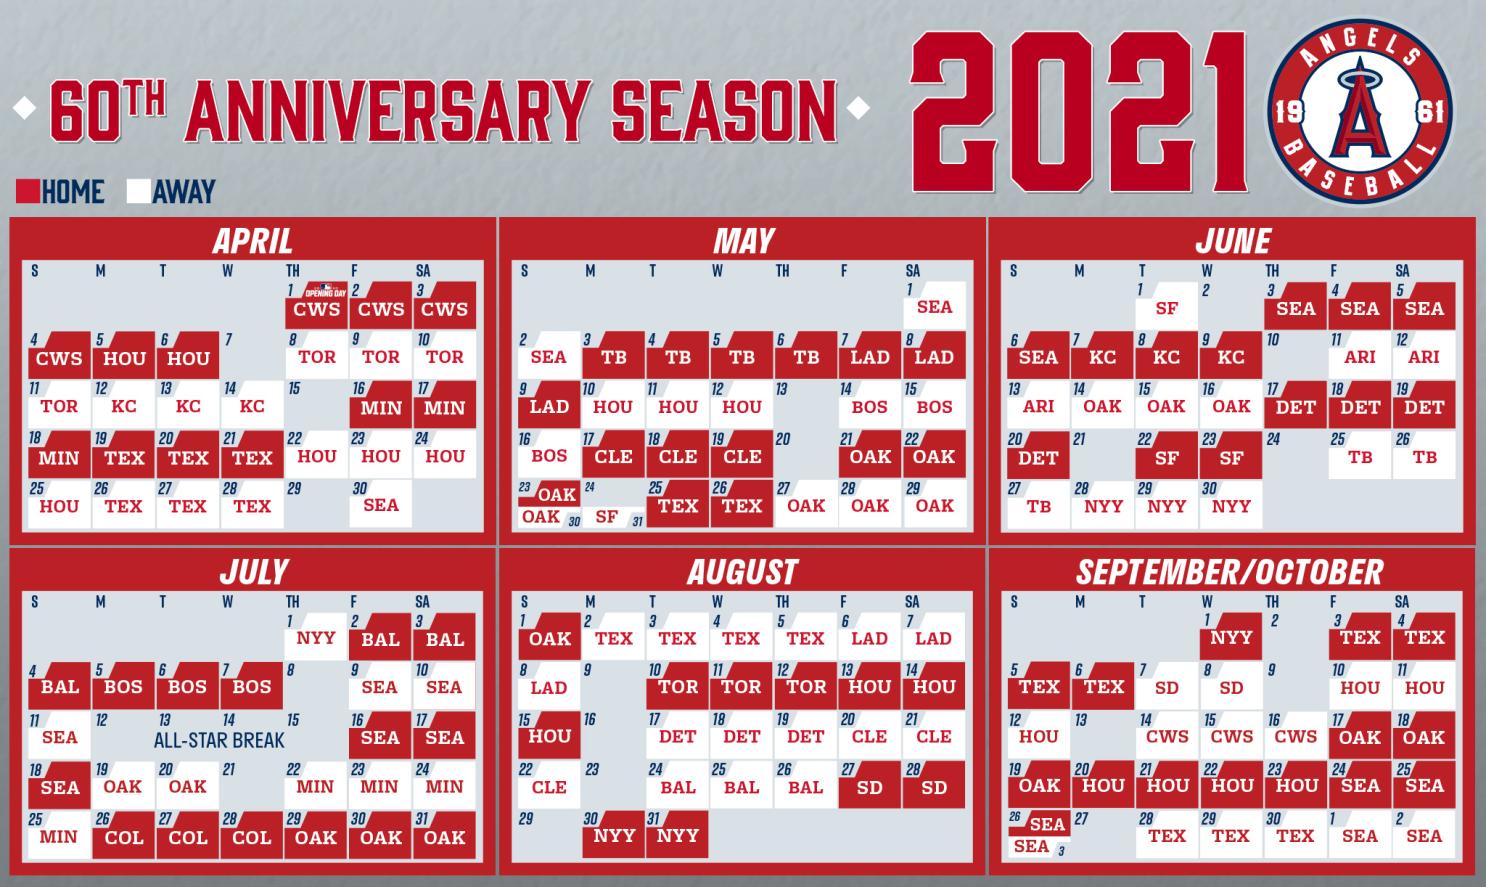 Dodgers Calendar Schedule 2021 Angels unveil their schedule for 2021 MLB regular season   Los